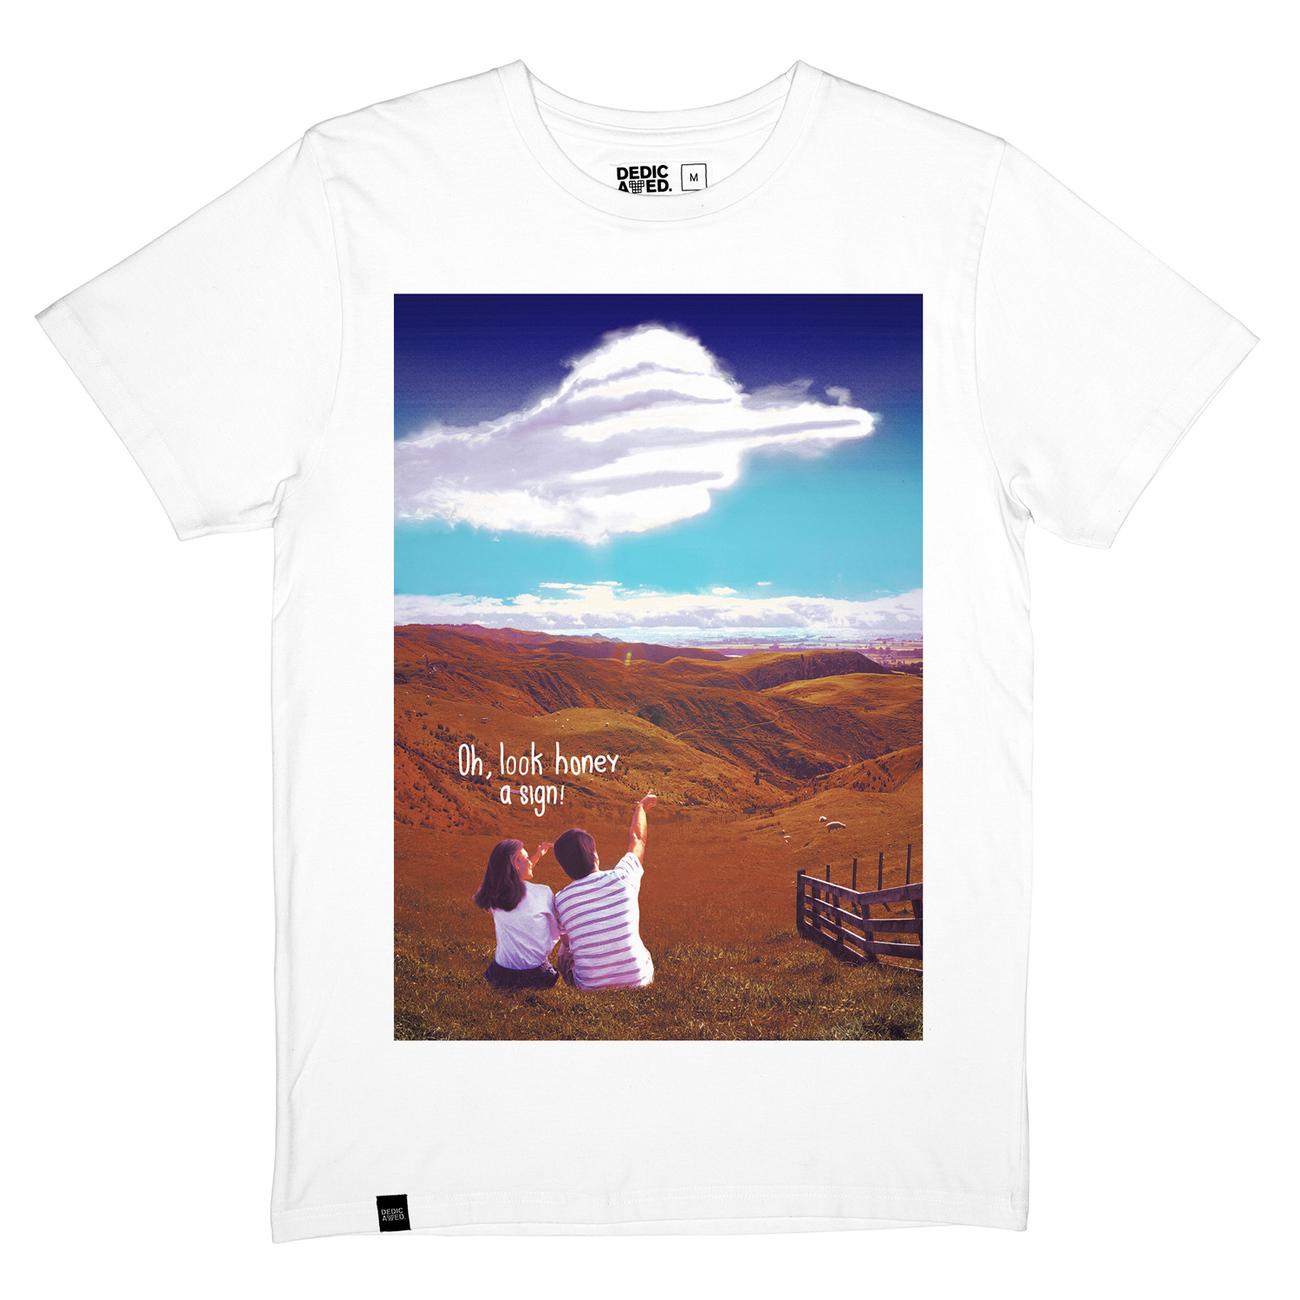 Stockholm T-shirt A Sign